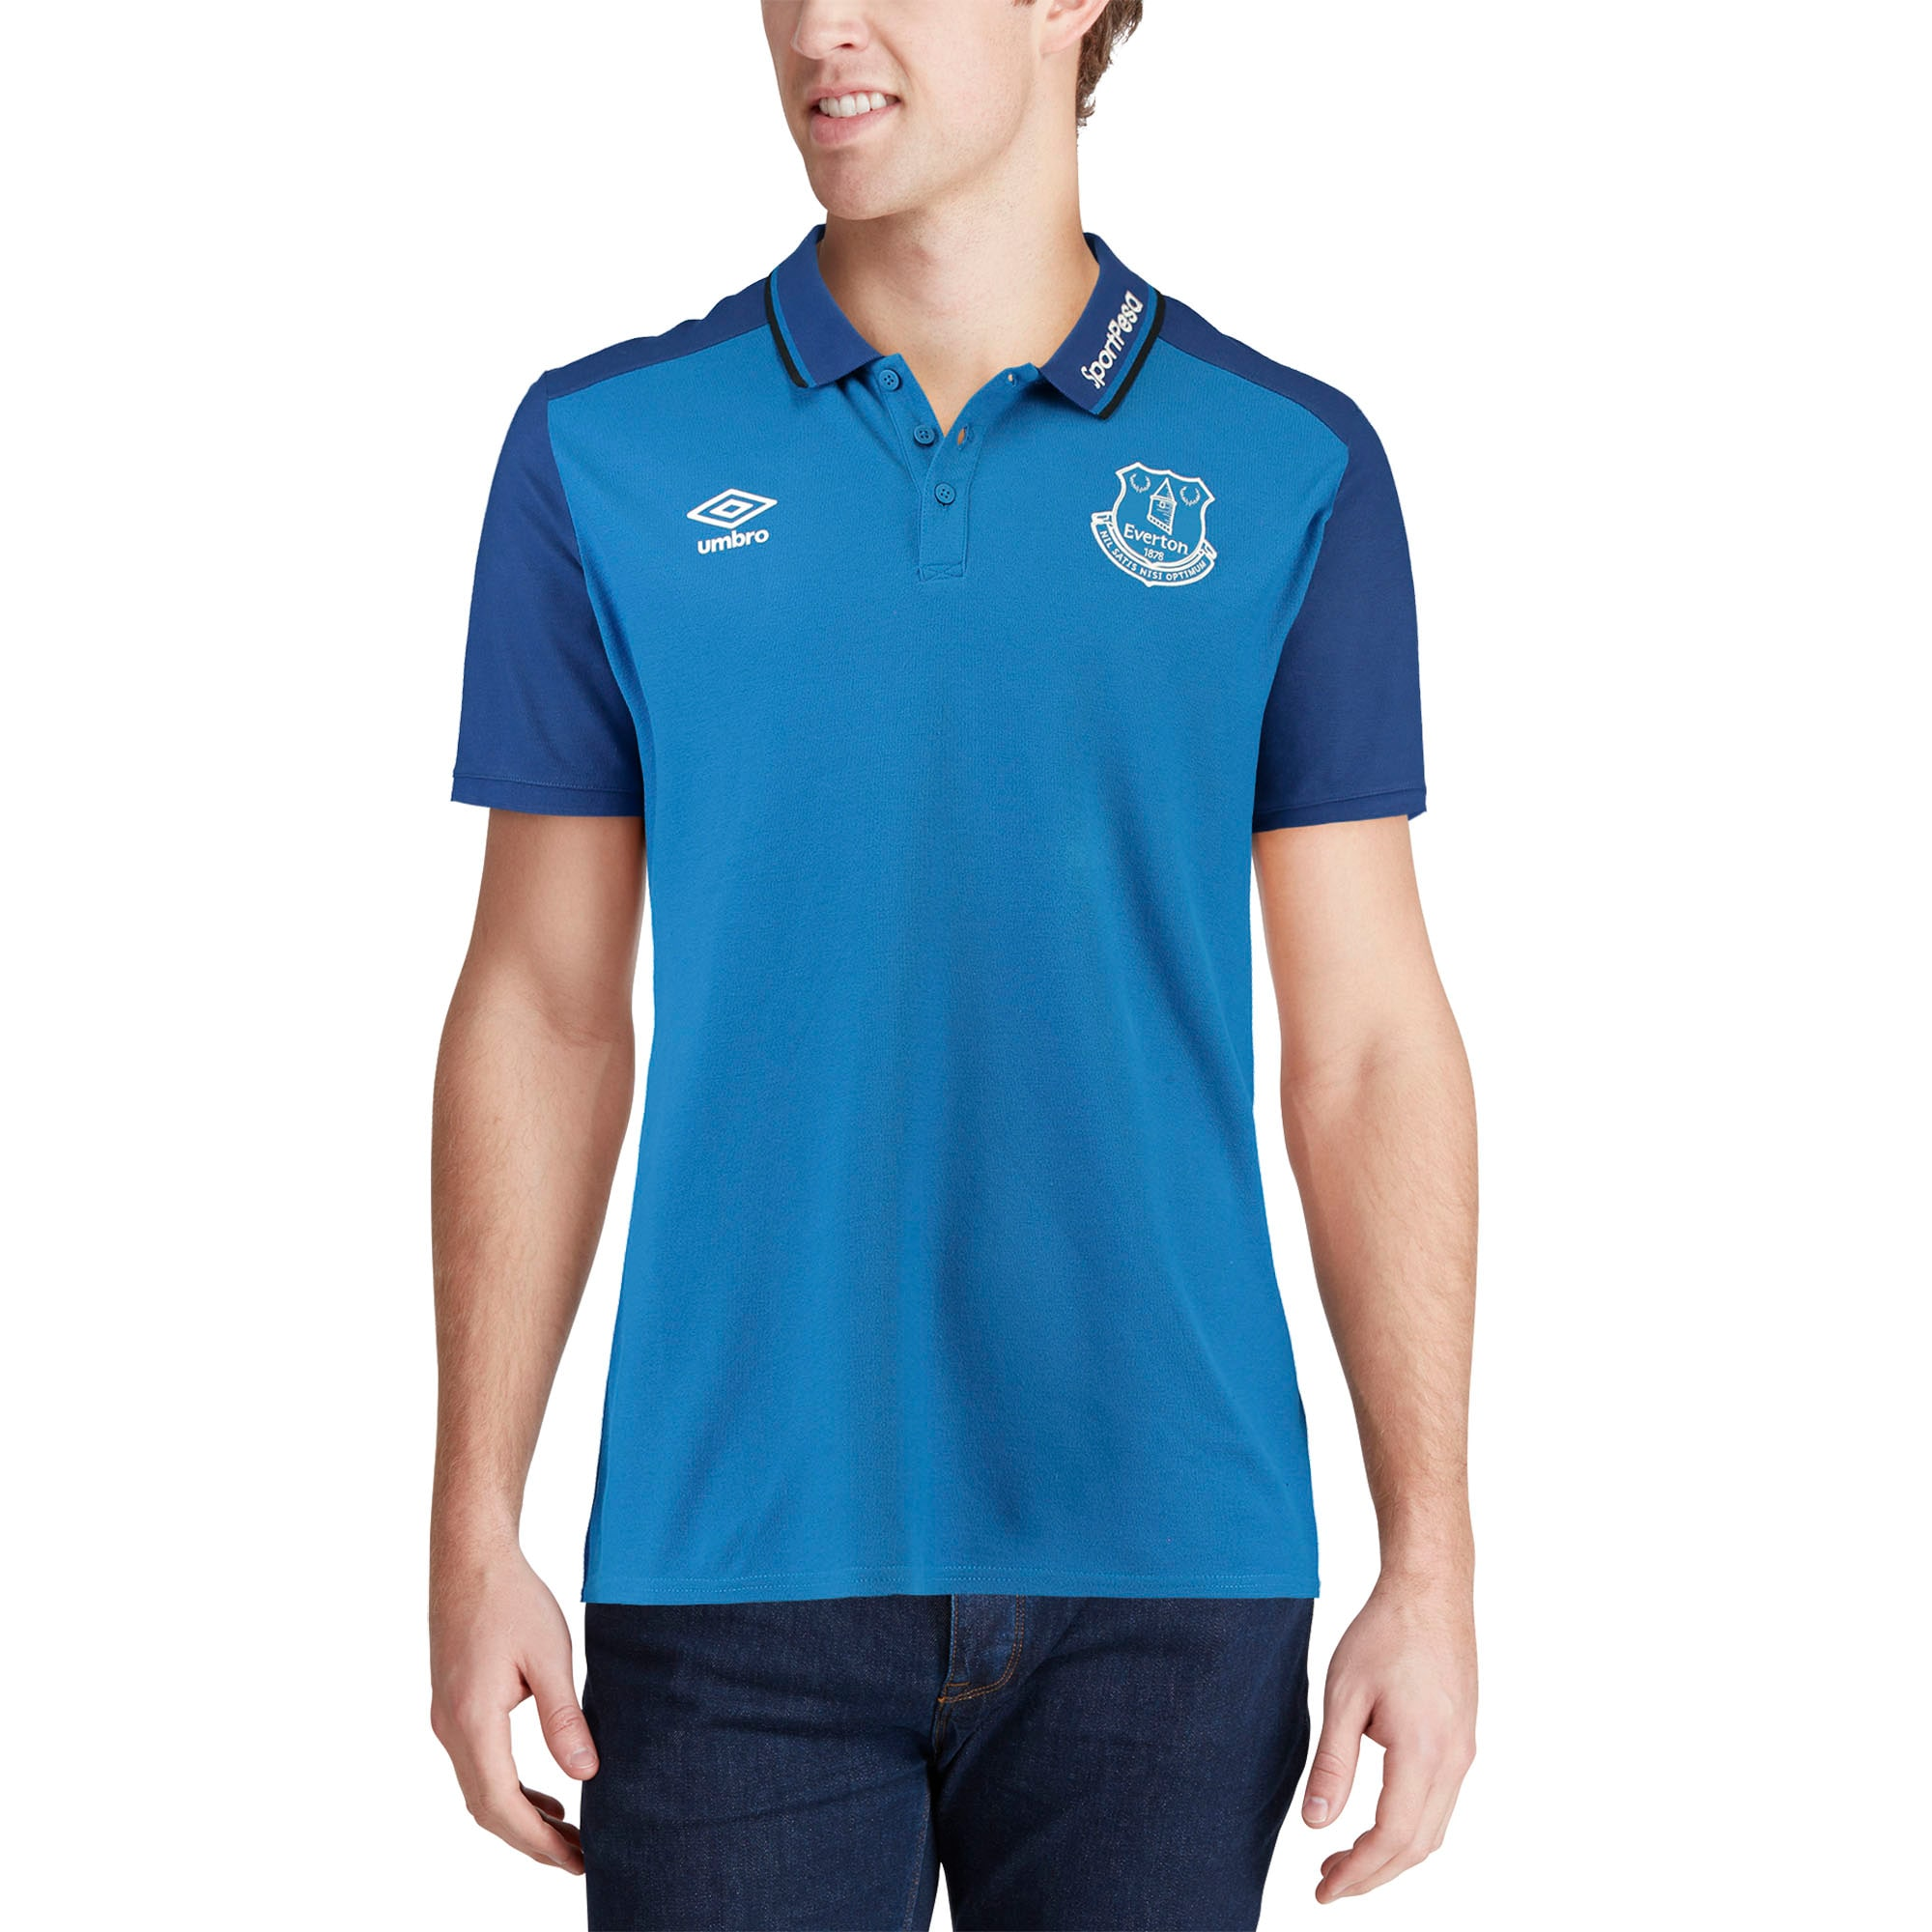 Cotton//Poly Training Polo Shirt Umbro Mens Premier League Everton F.C Skydiver Blue//Sodalite Blue